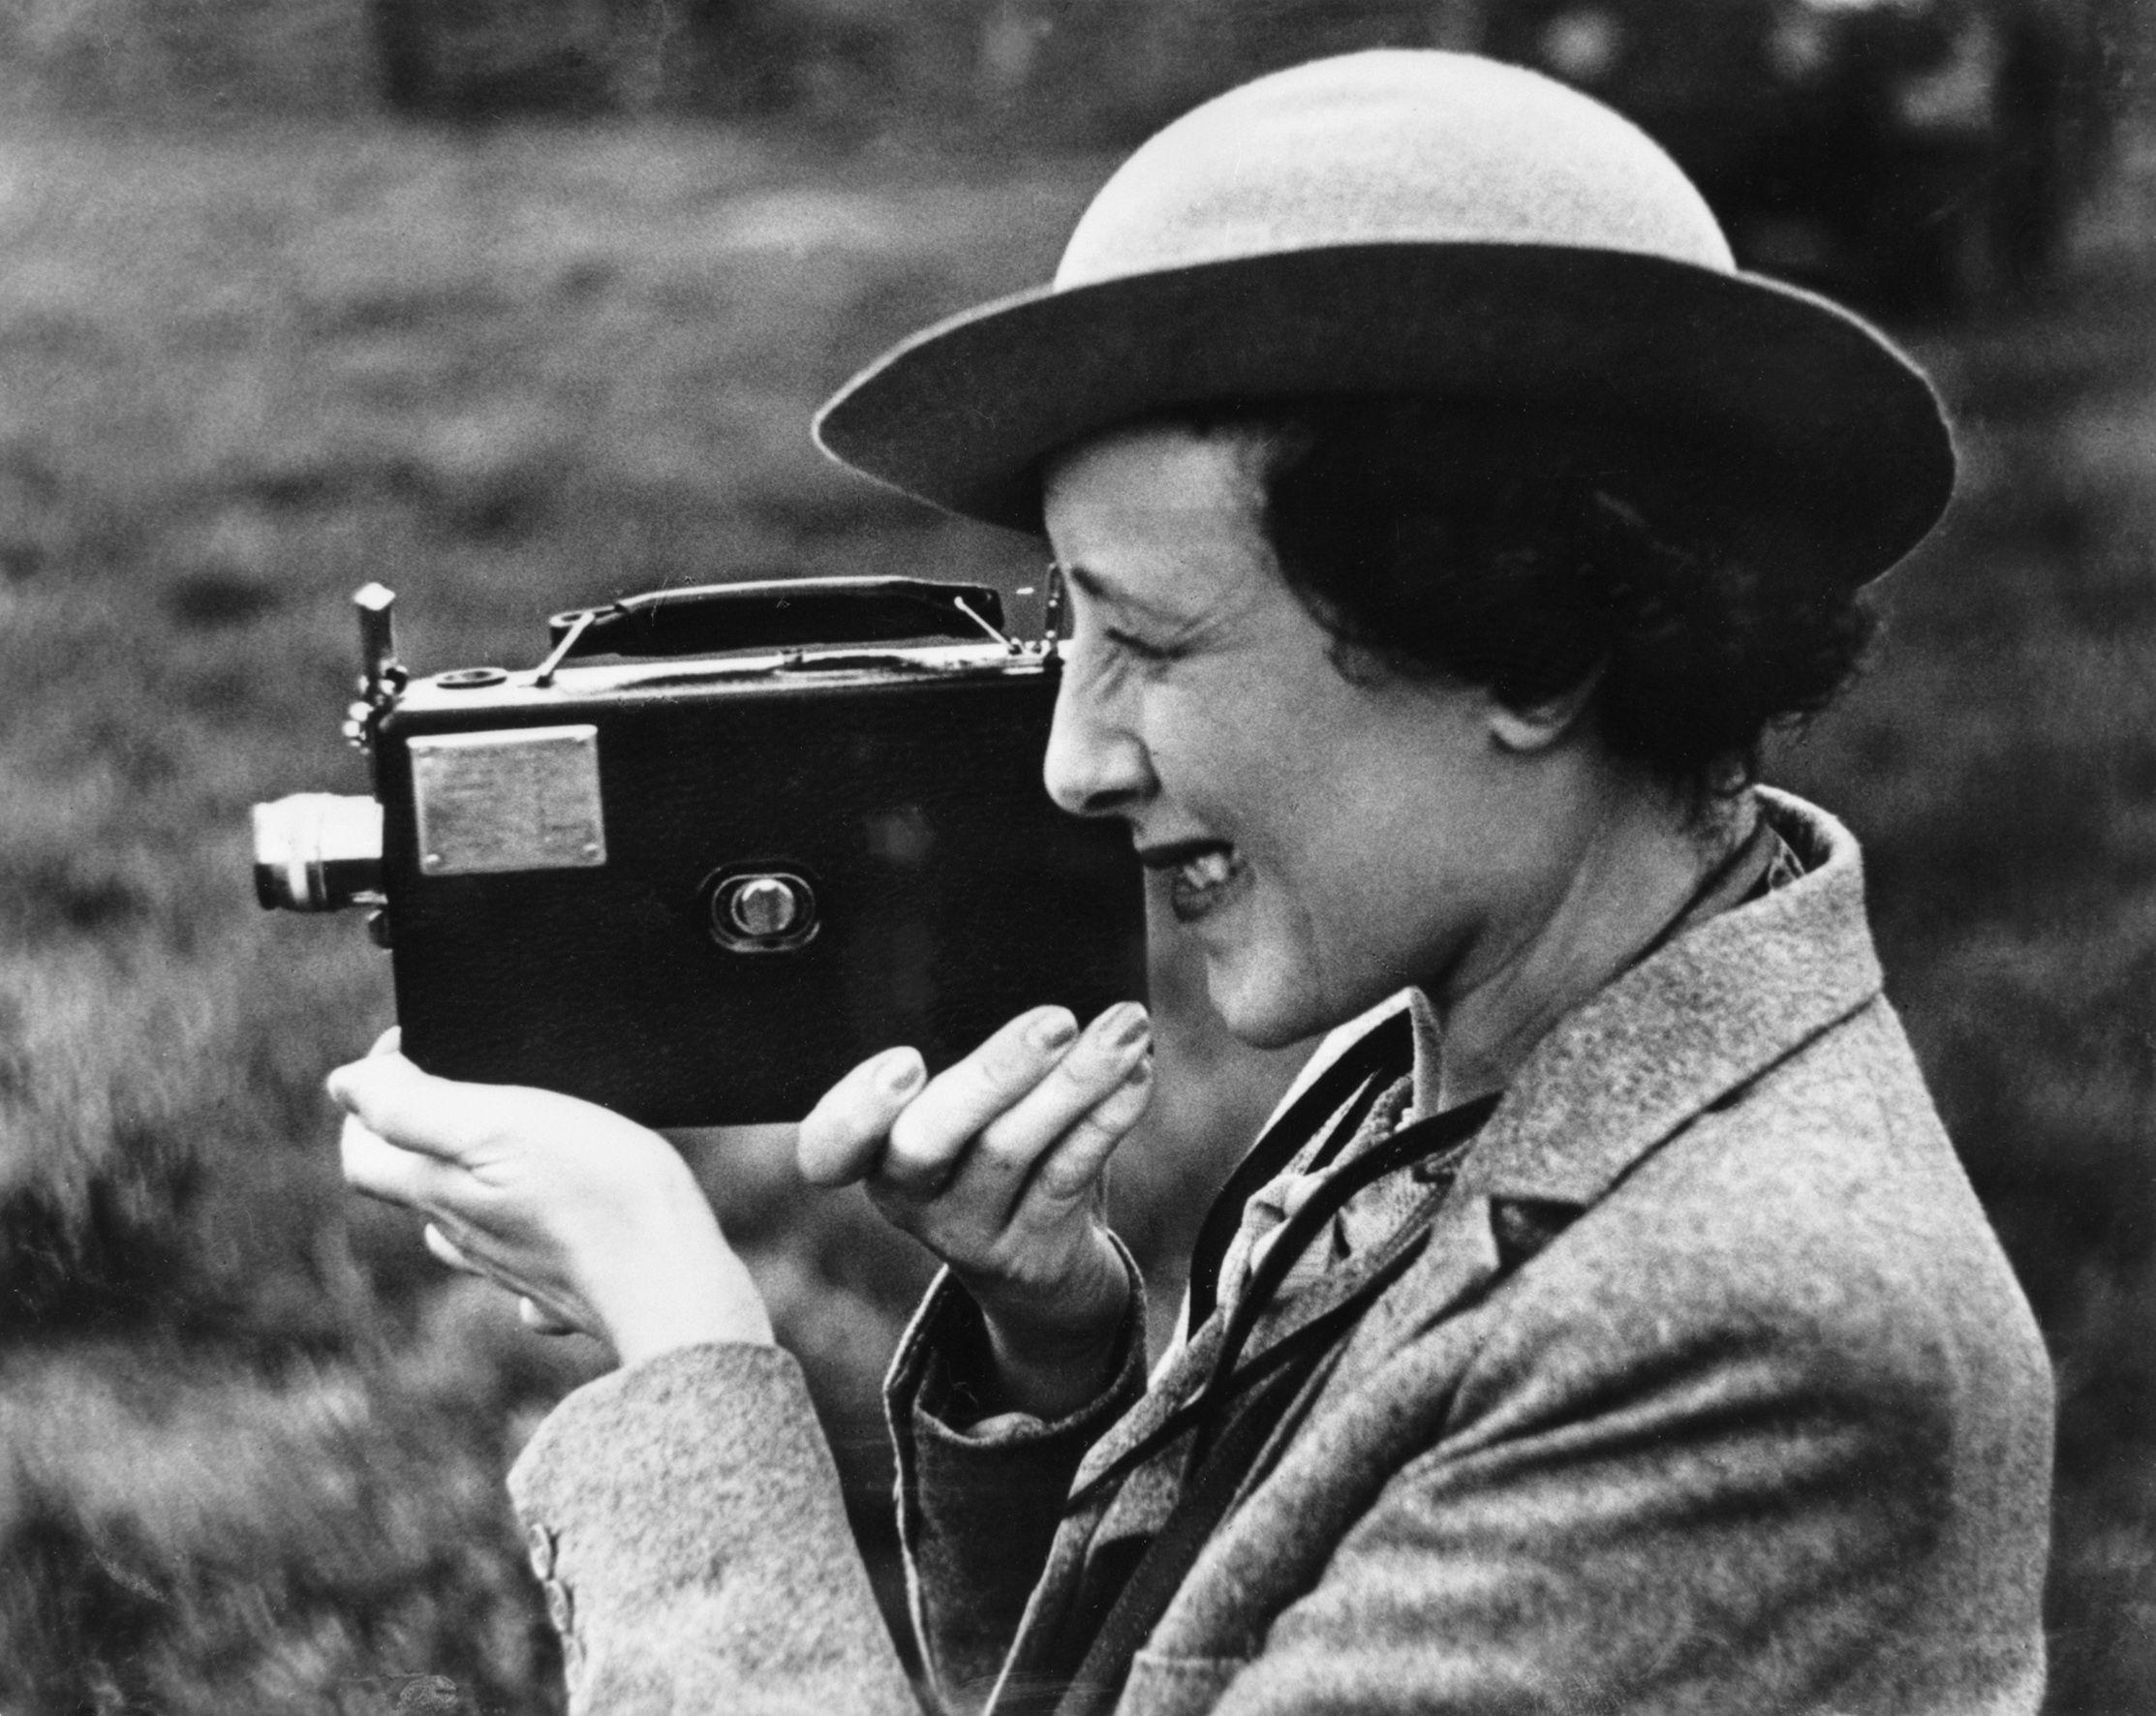 amateur film maker